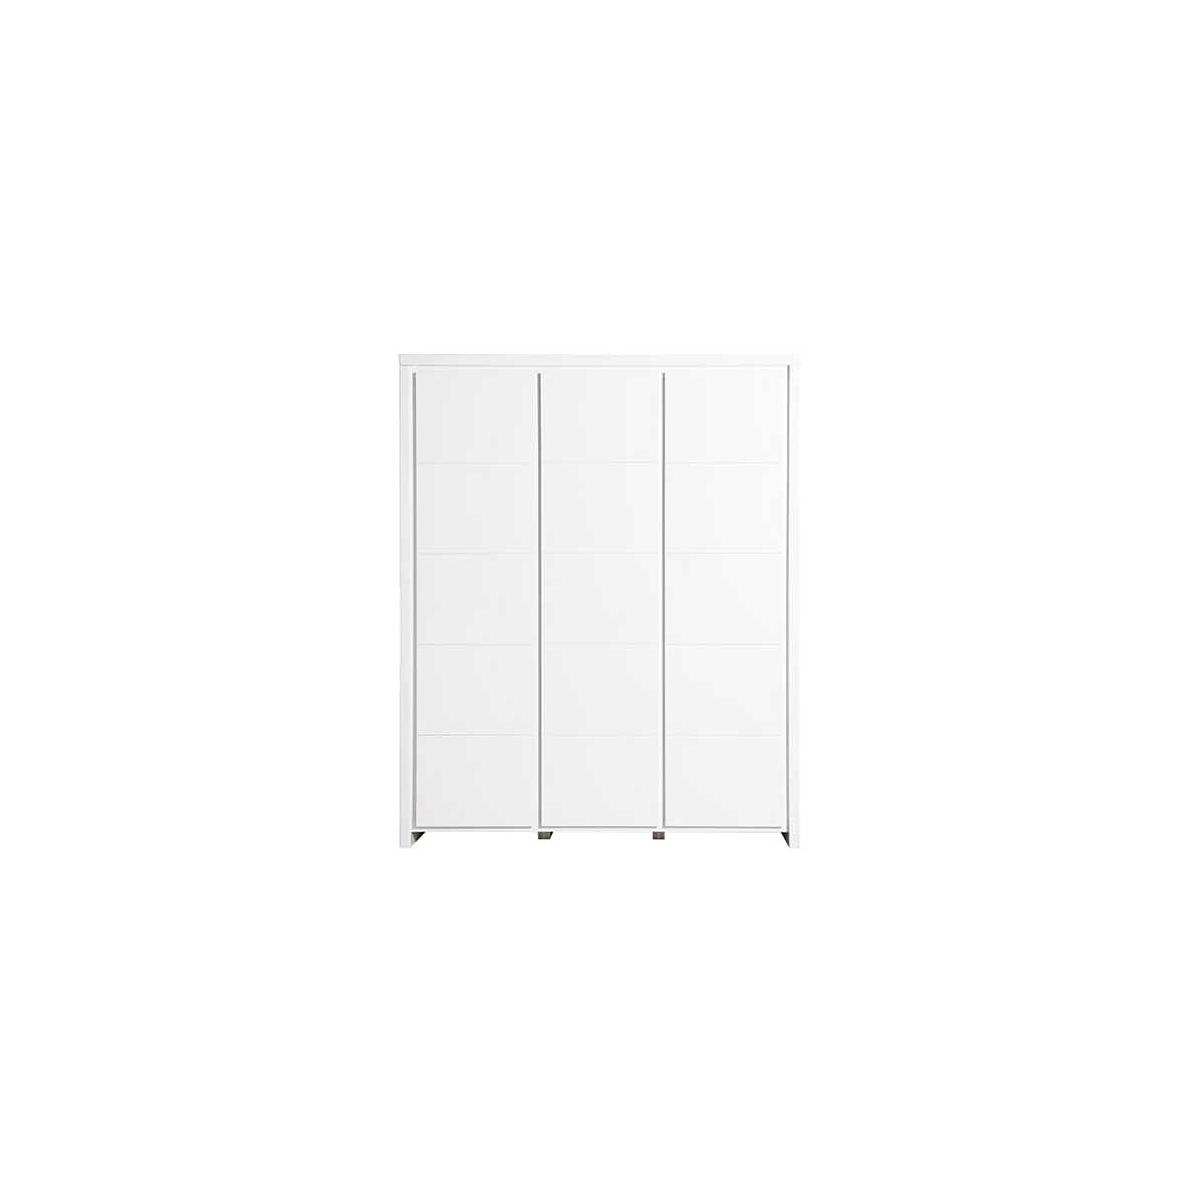 CAMILLE by Bopita Armoire 3 portes